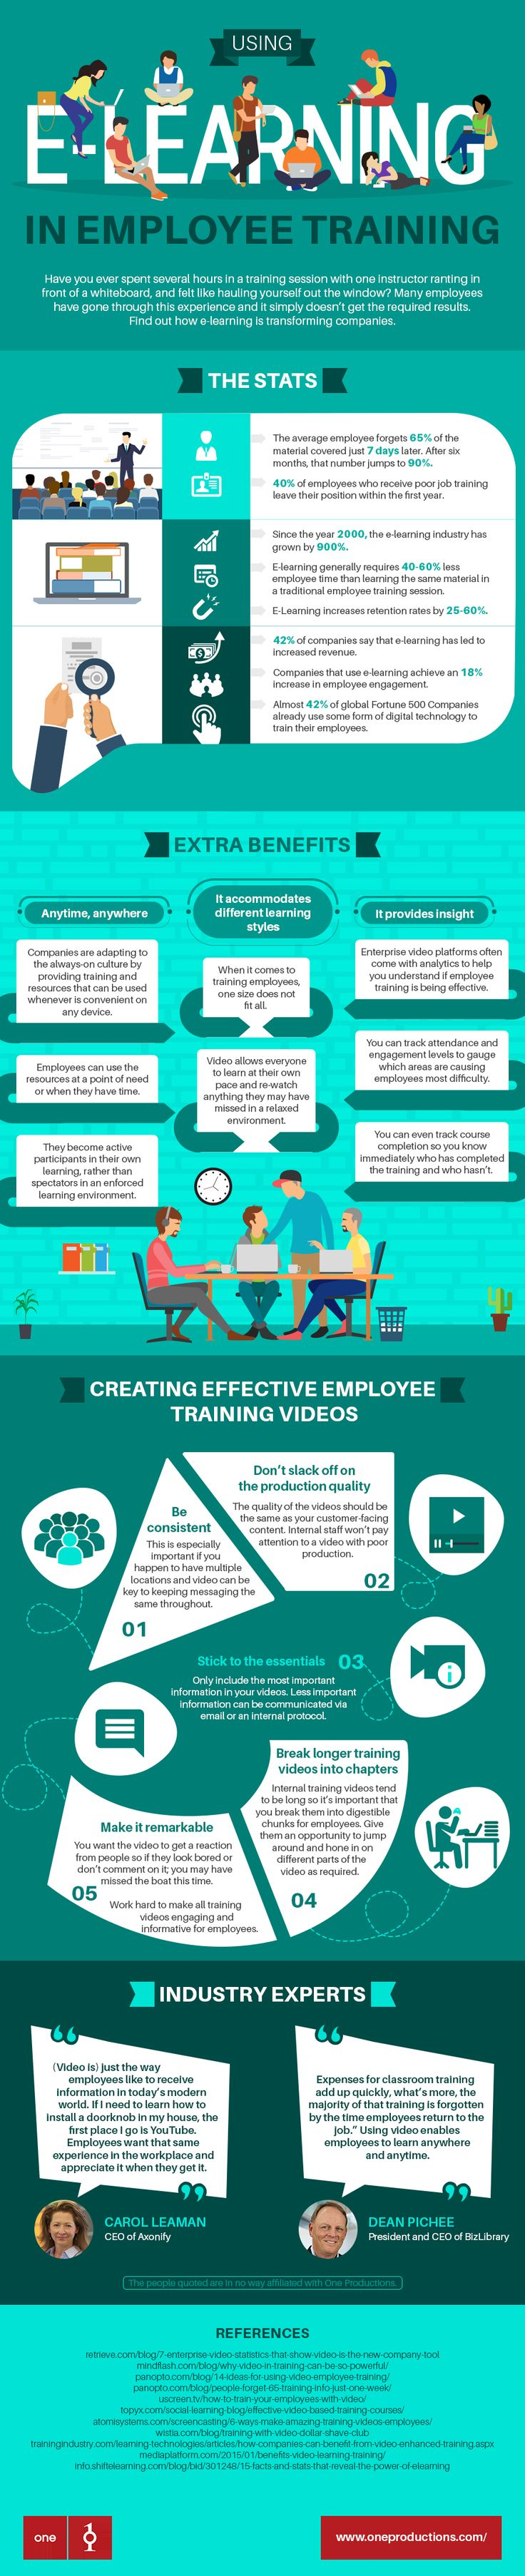 Using eLearning in Employee Training Infographic - https://elearninginfographics.com/using-elearning-employee-training-infographic/